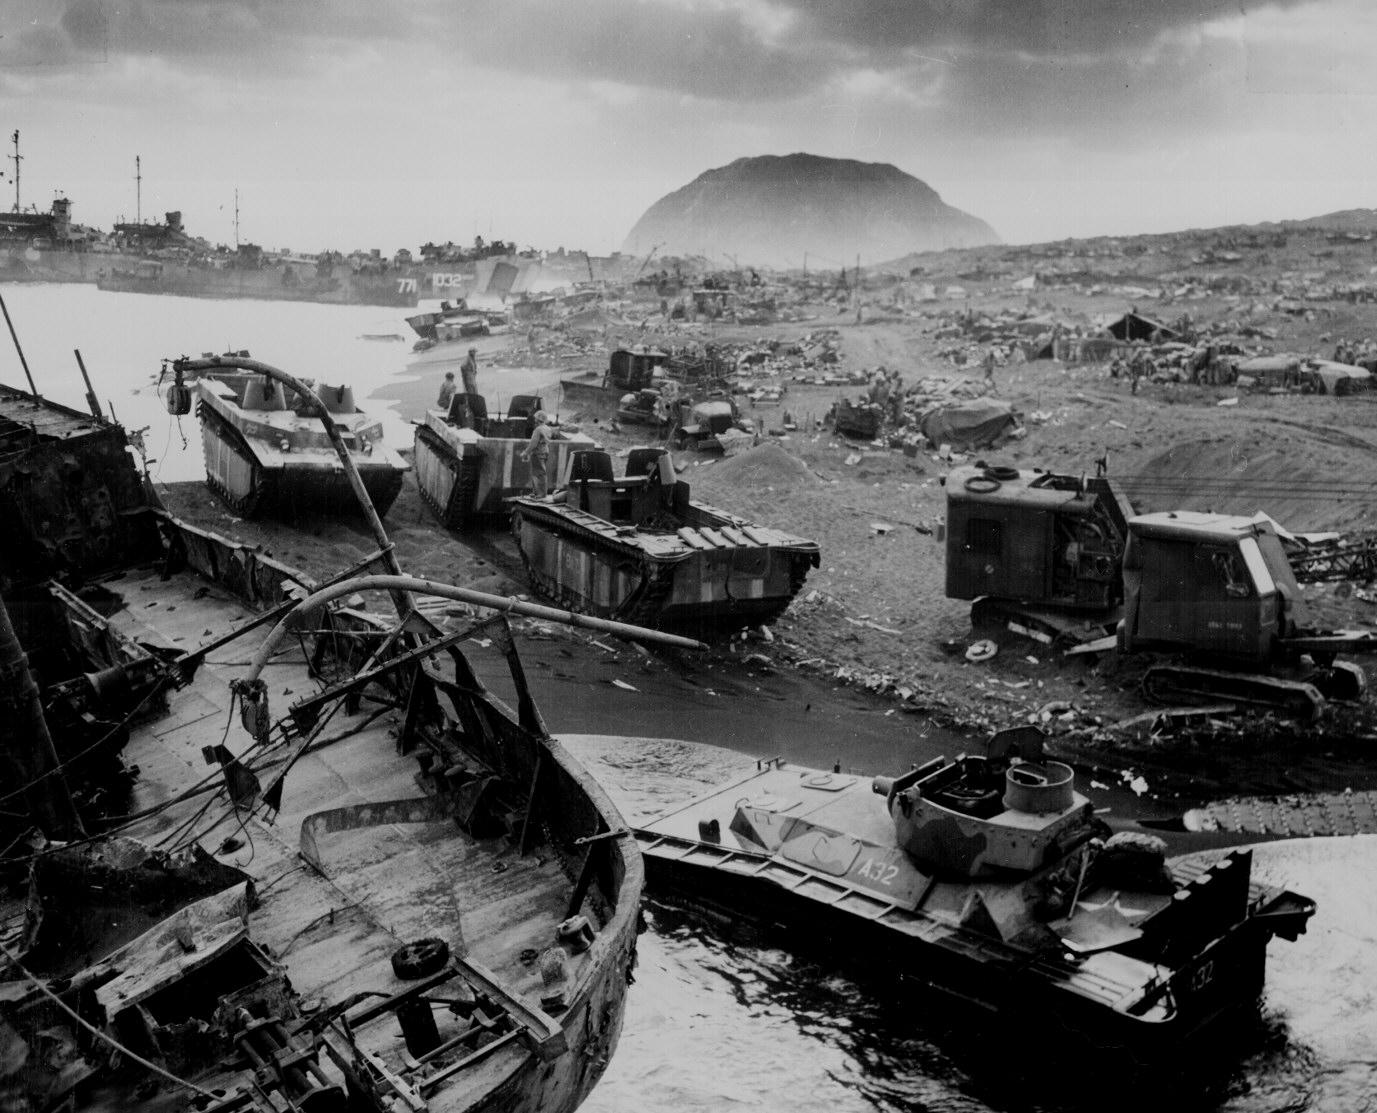 la bataille d'Iwo jima Ww2-155